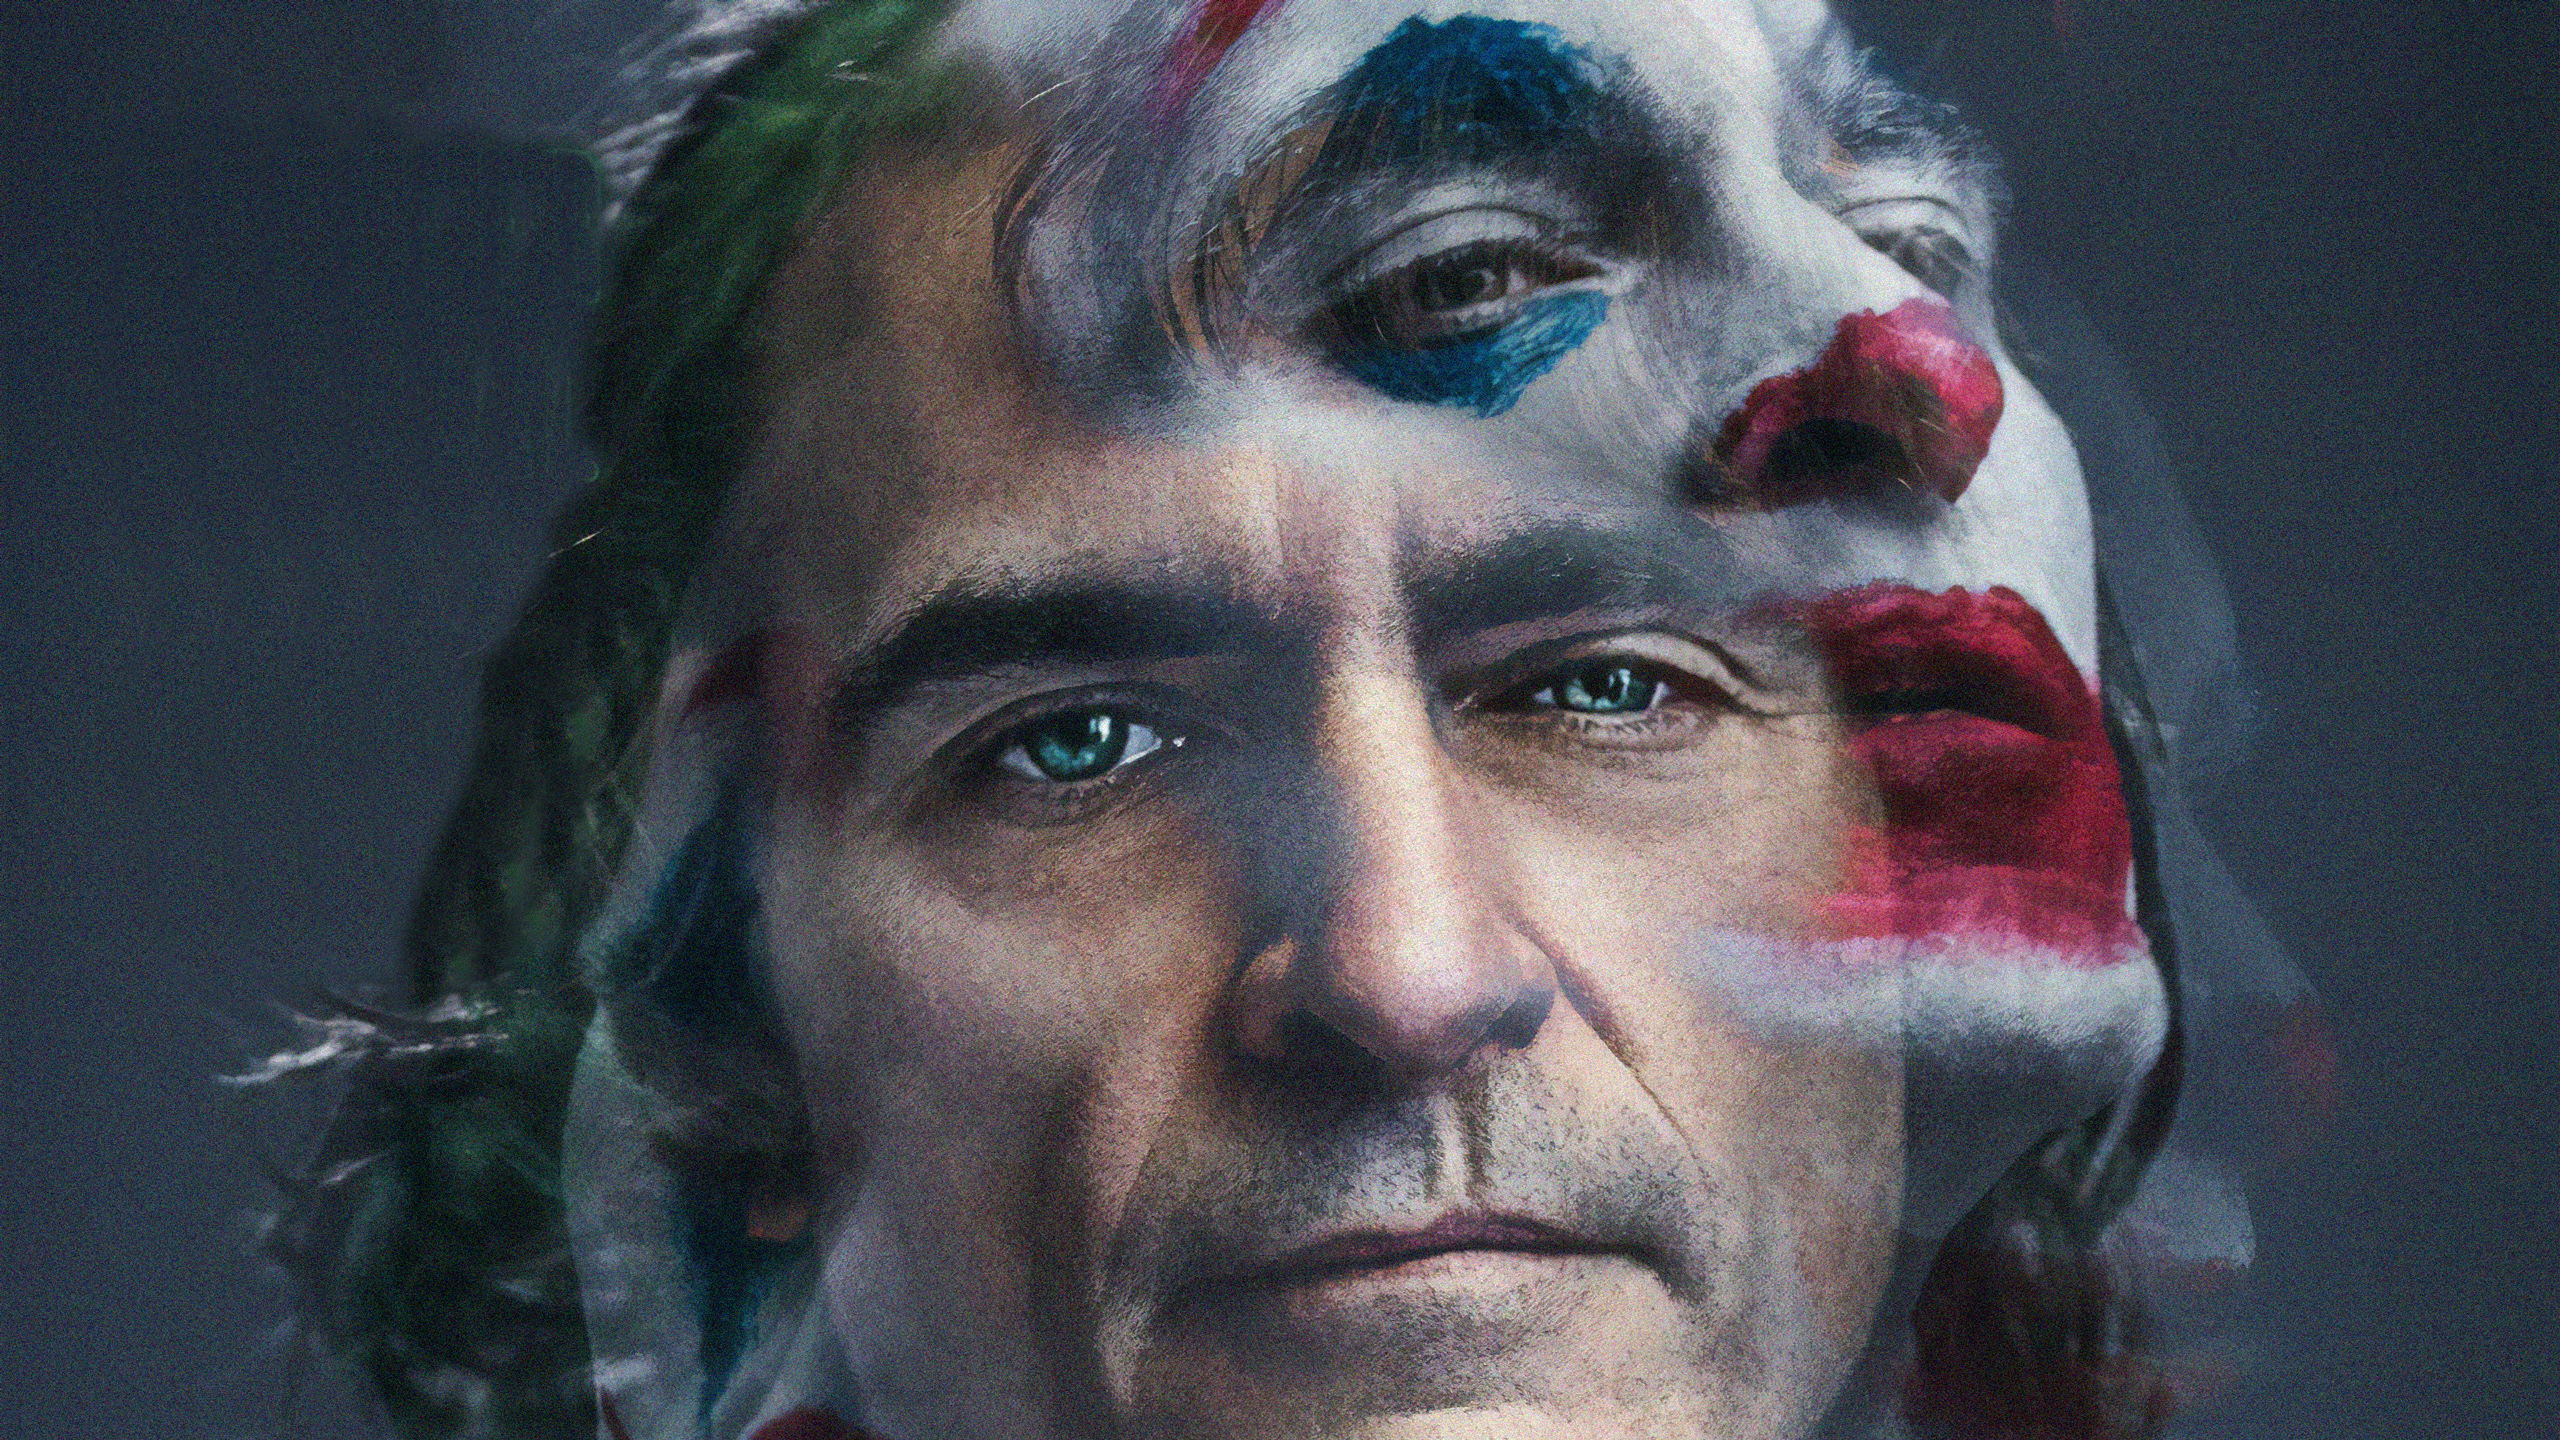 Joker 2019 Empire Magazine Hd Movies 4k Wallpapers Images